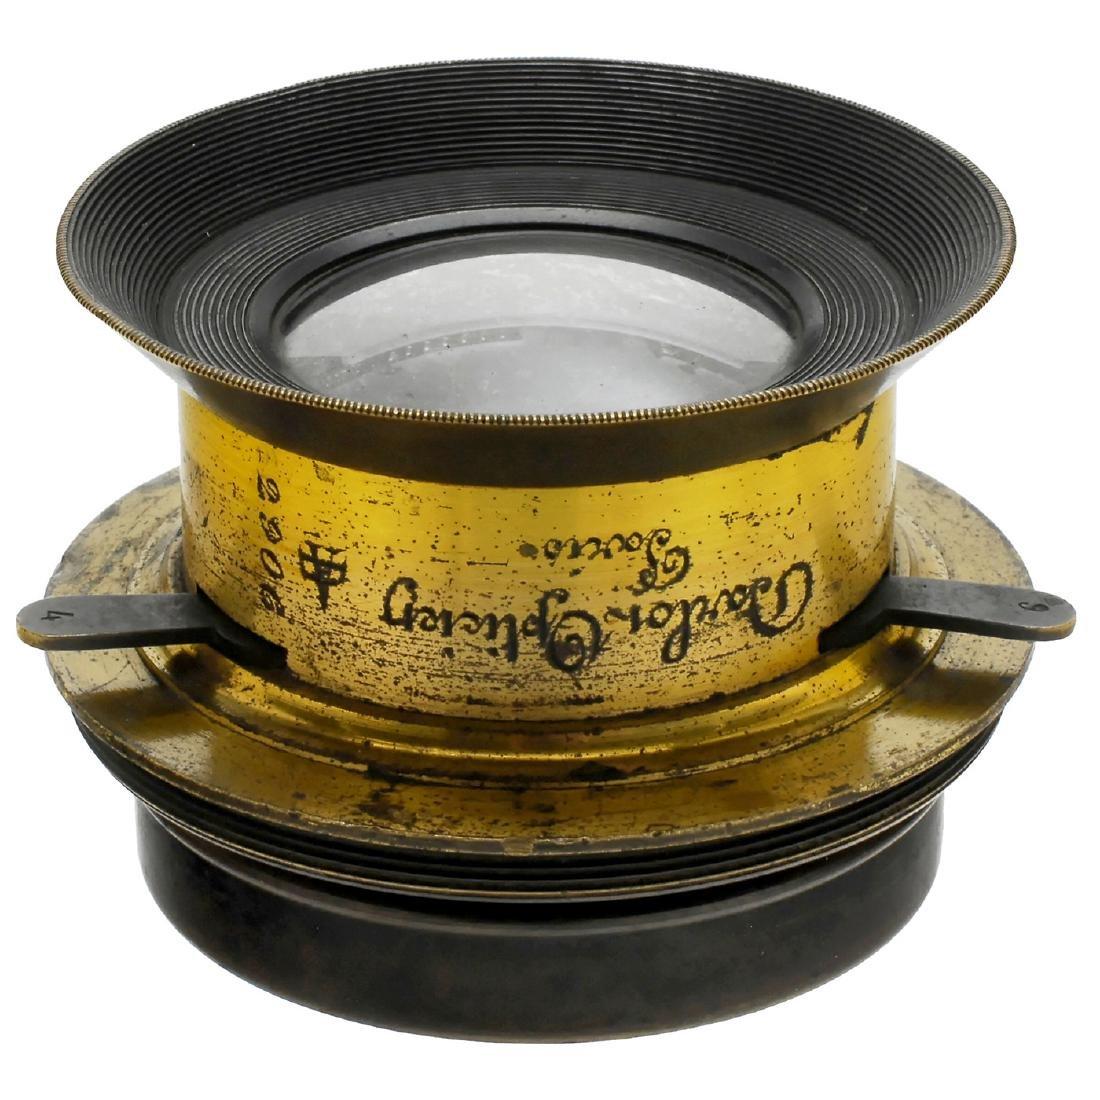 "Darlot ""Hémisphèrique"" Wide-Angle Lens, c. 1866"